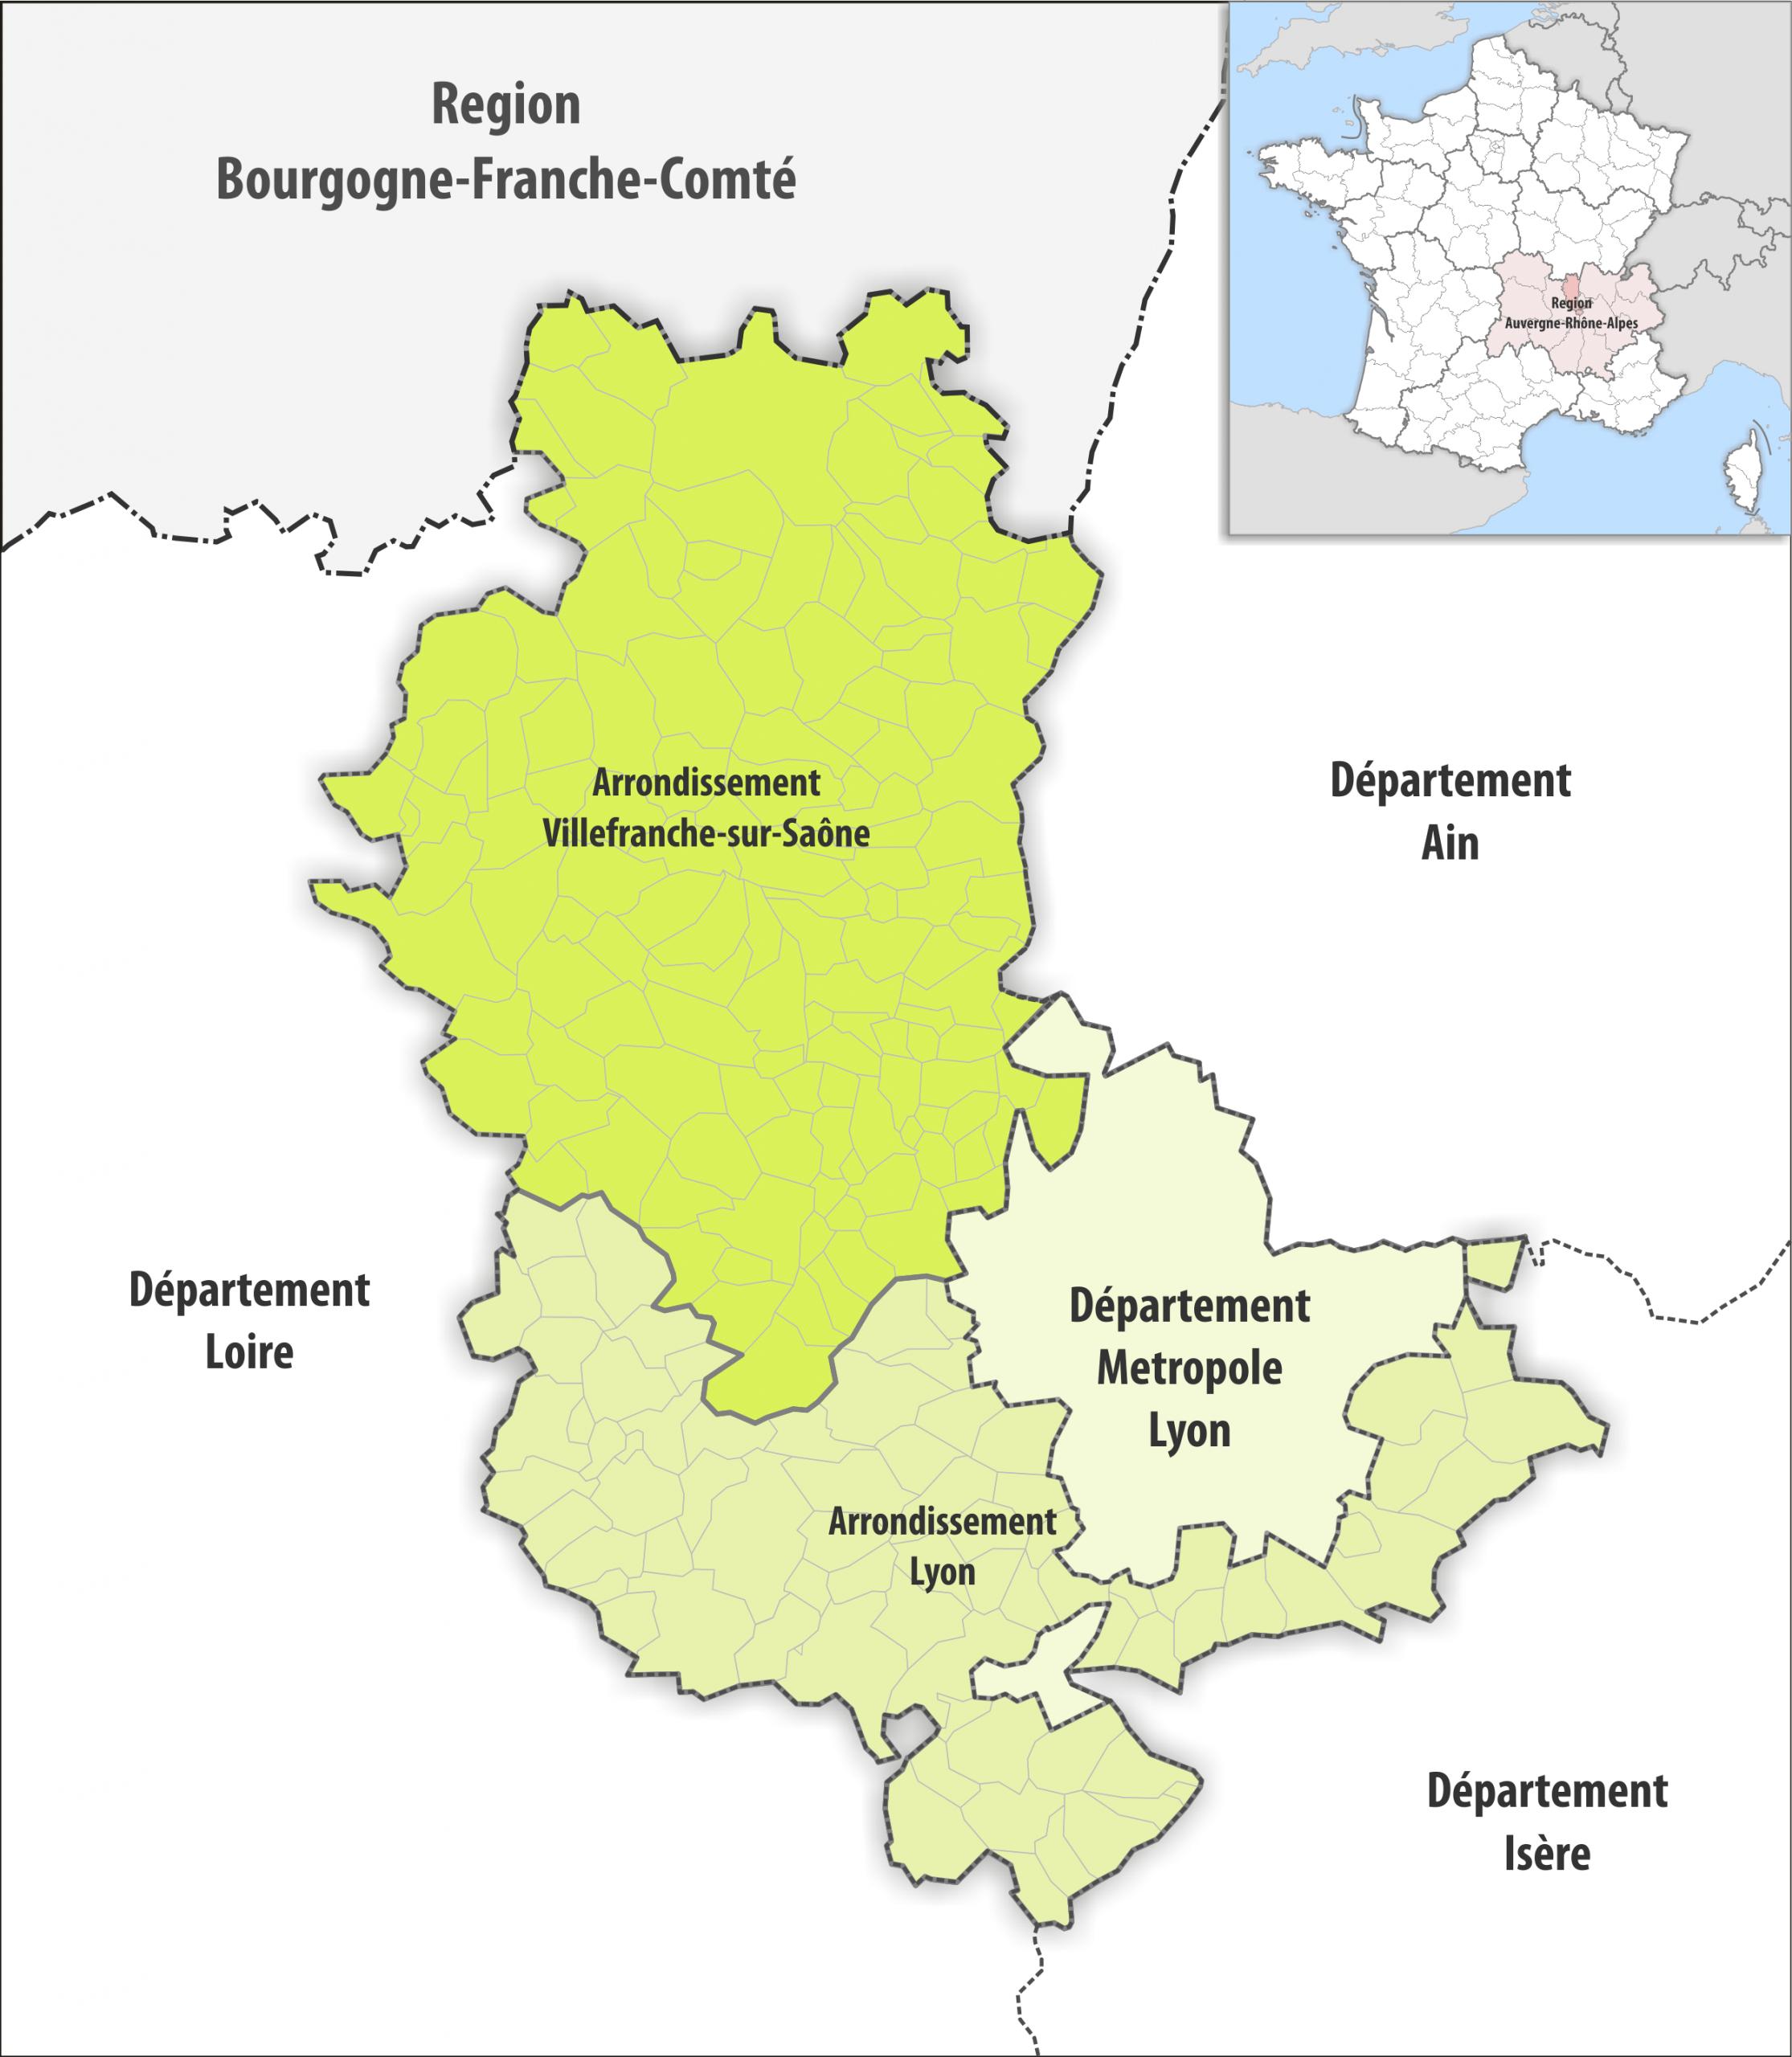 File:département Rhône Arrondissement 2019 - Wikimedia dedans Departement 22 Region